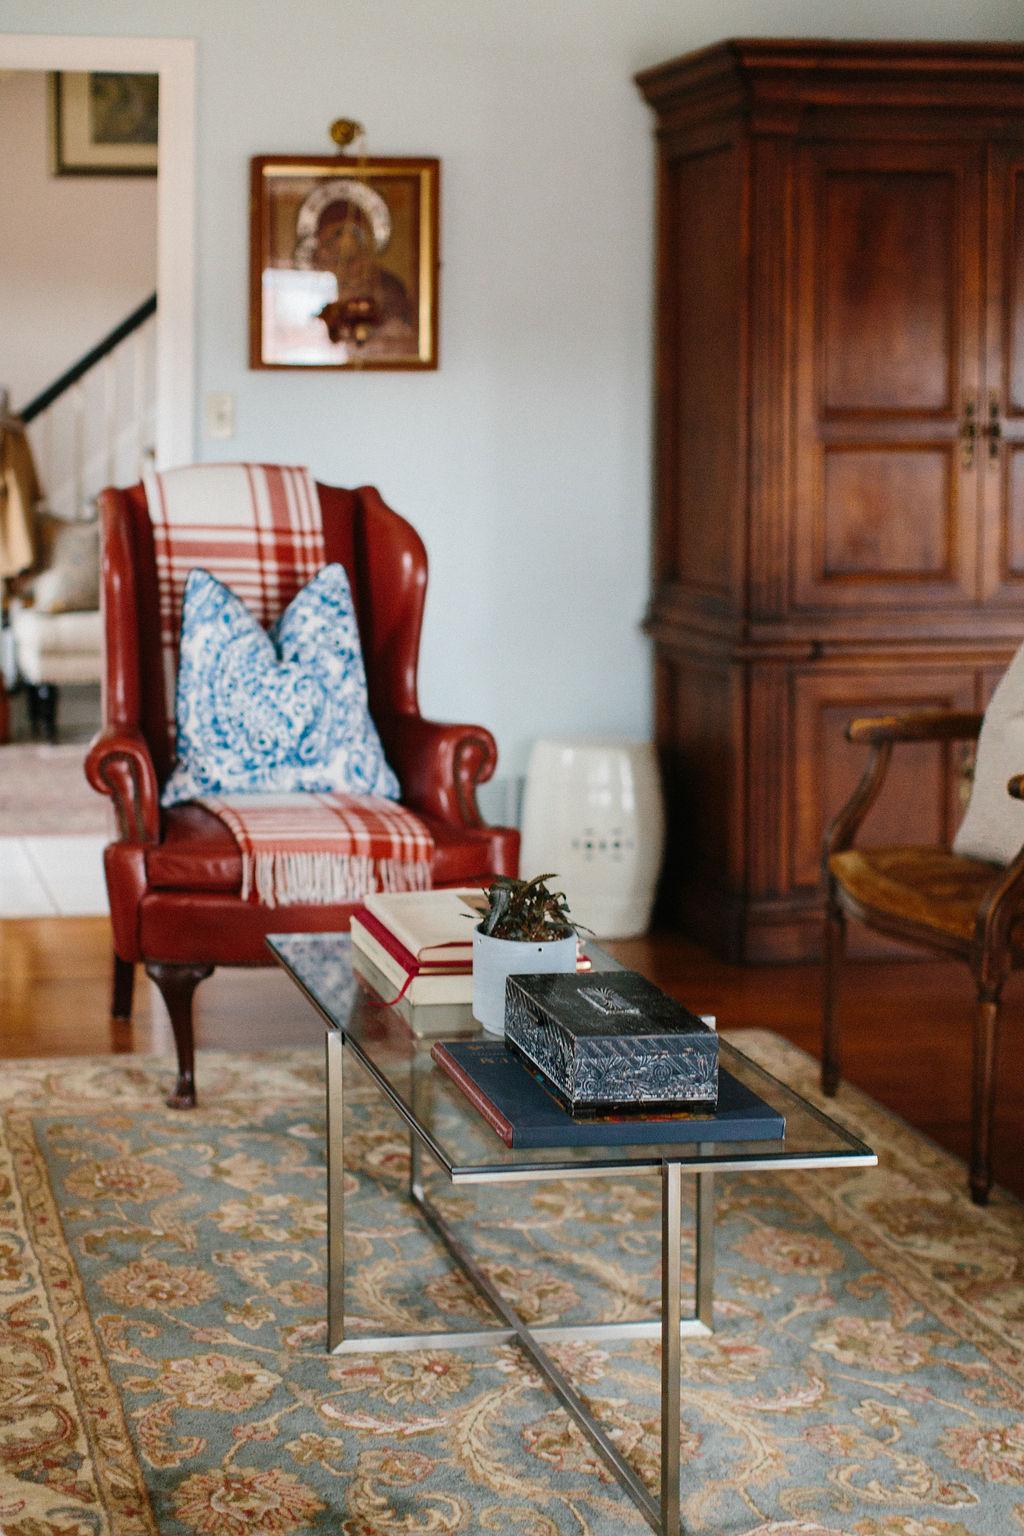 Journey-Jacobs-Design-Studio-Louisville-Residential-Commercial-Hospitality-Interior-Design-Traditional-Modern-27.JPG